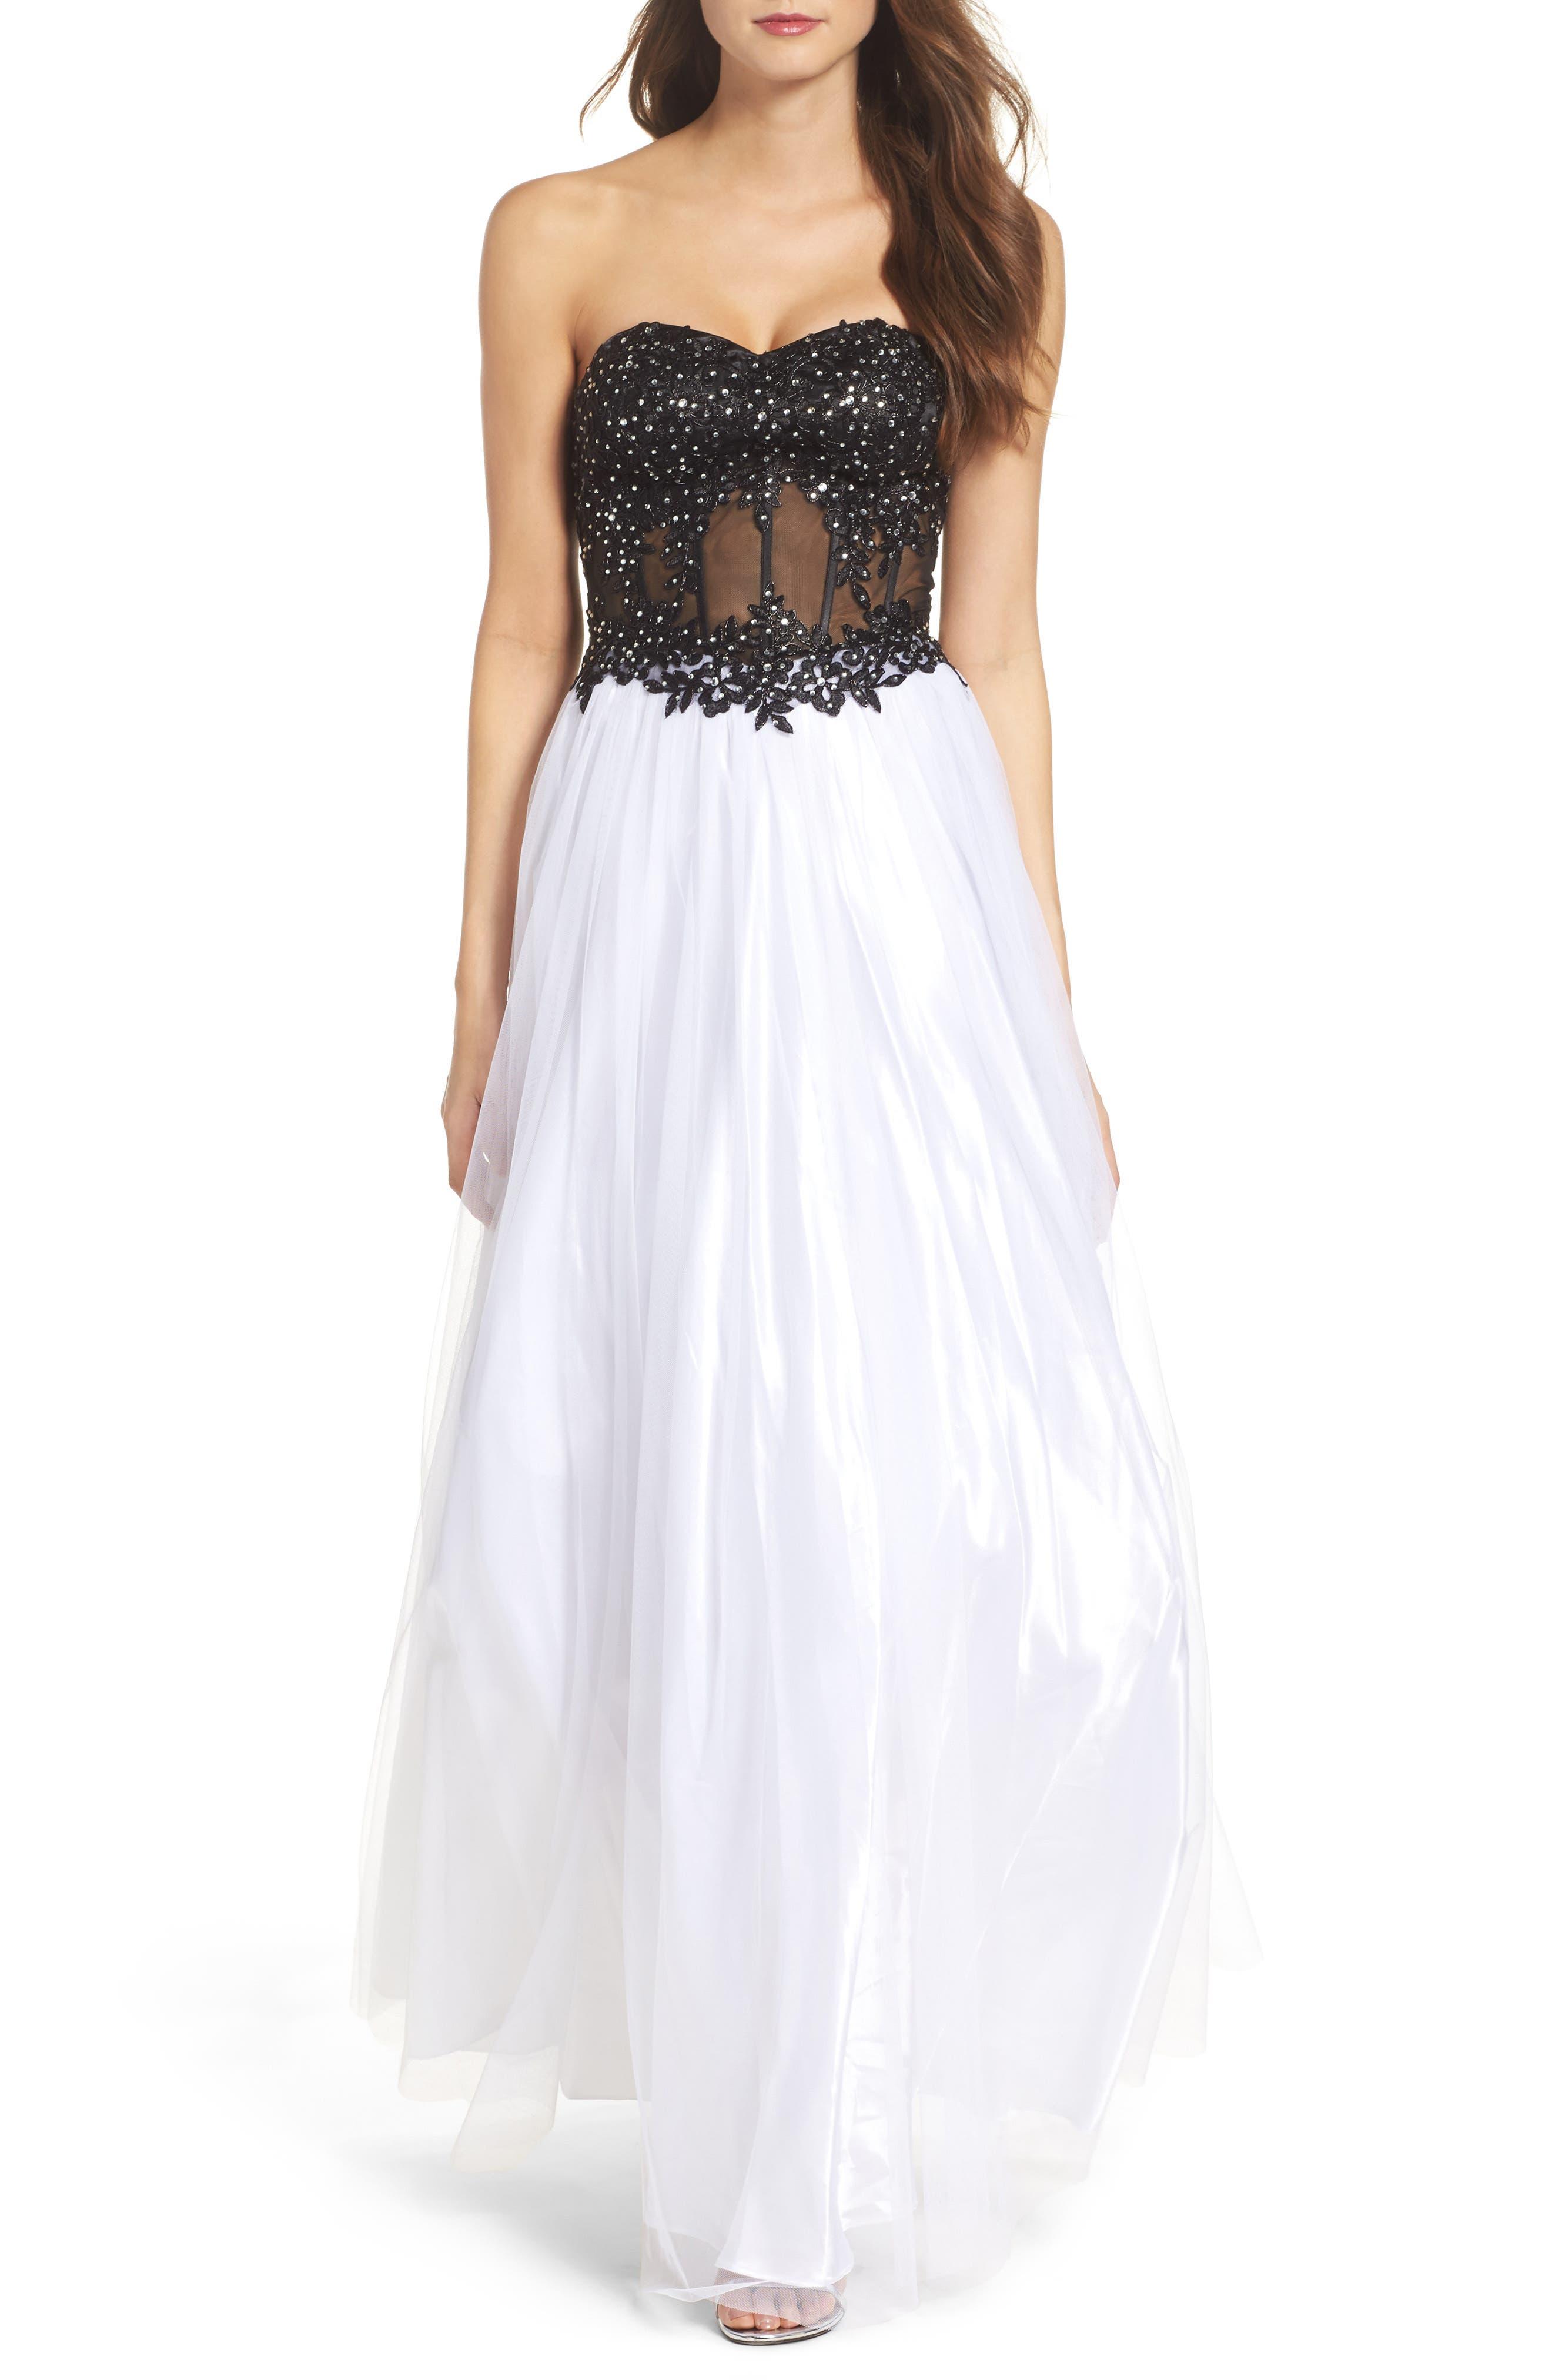 Alternate Image 1 Selected - Blondie Nites Strapless Bustier Gown